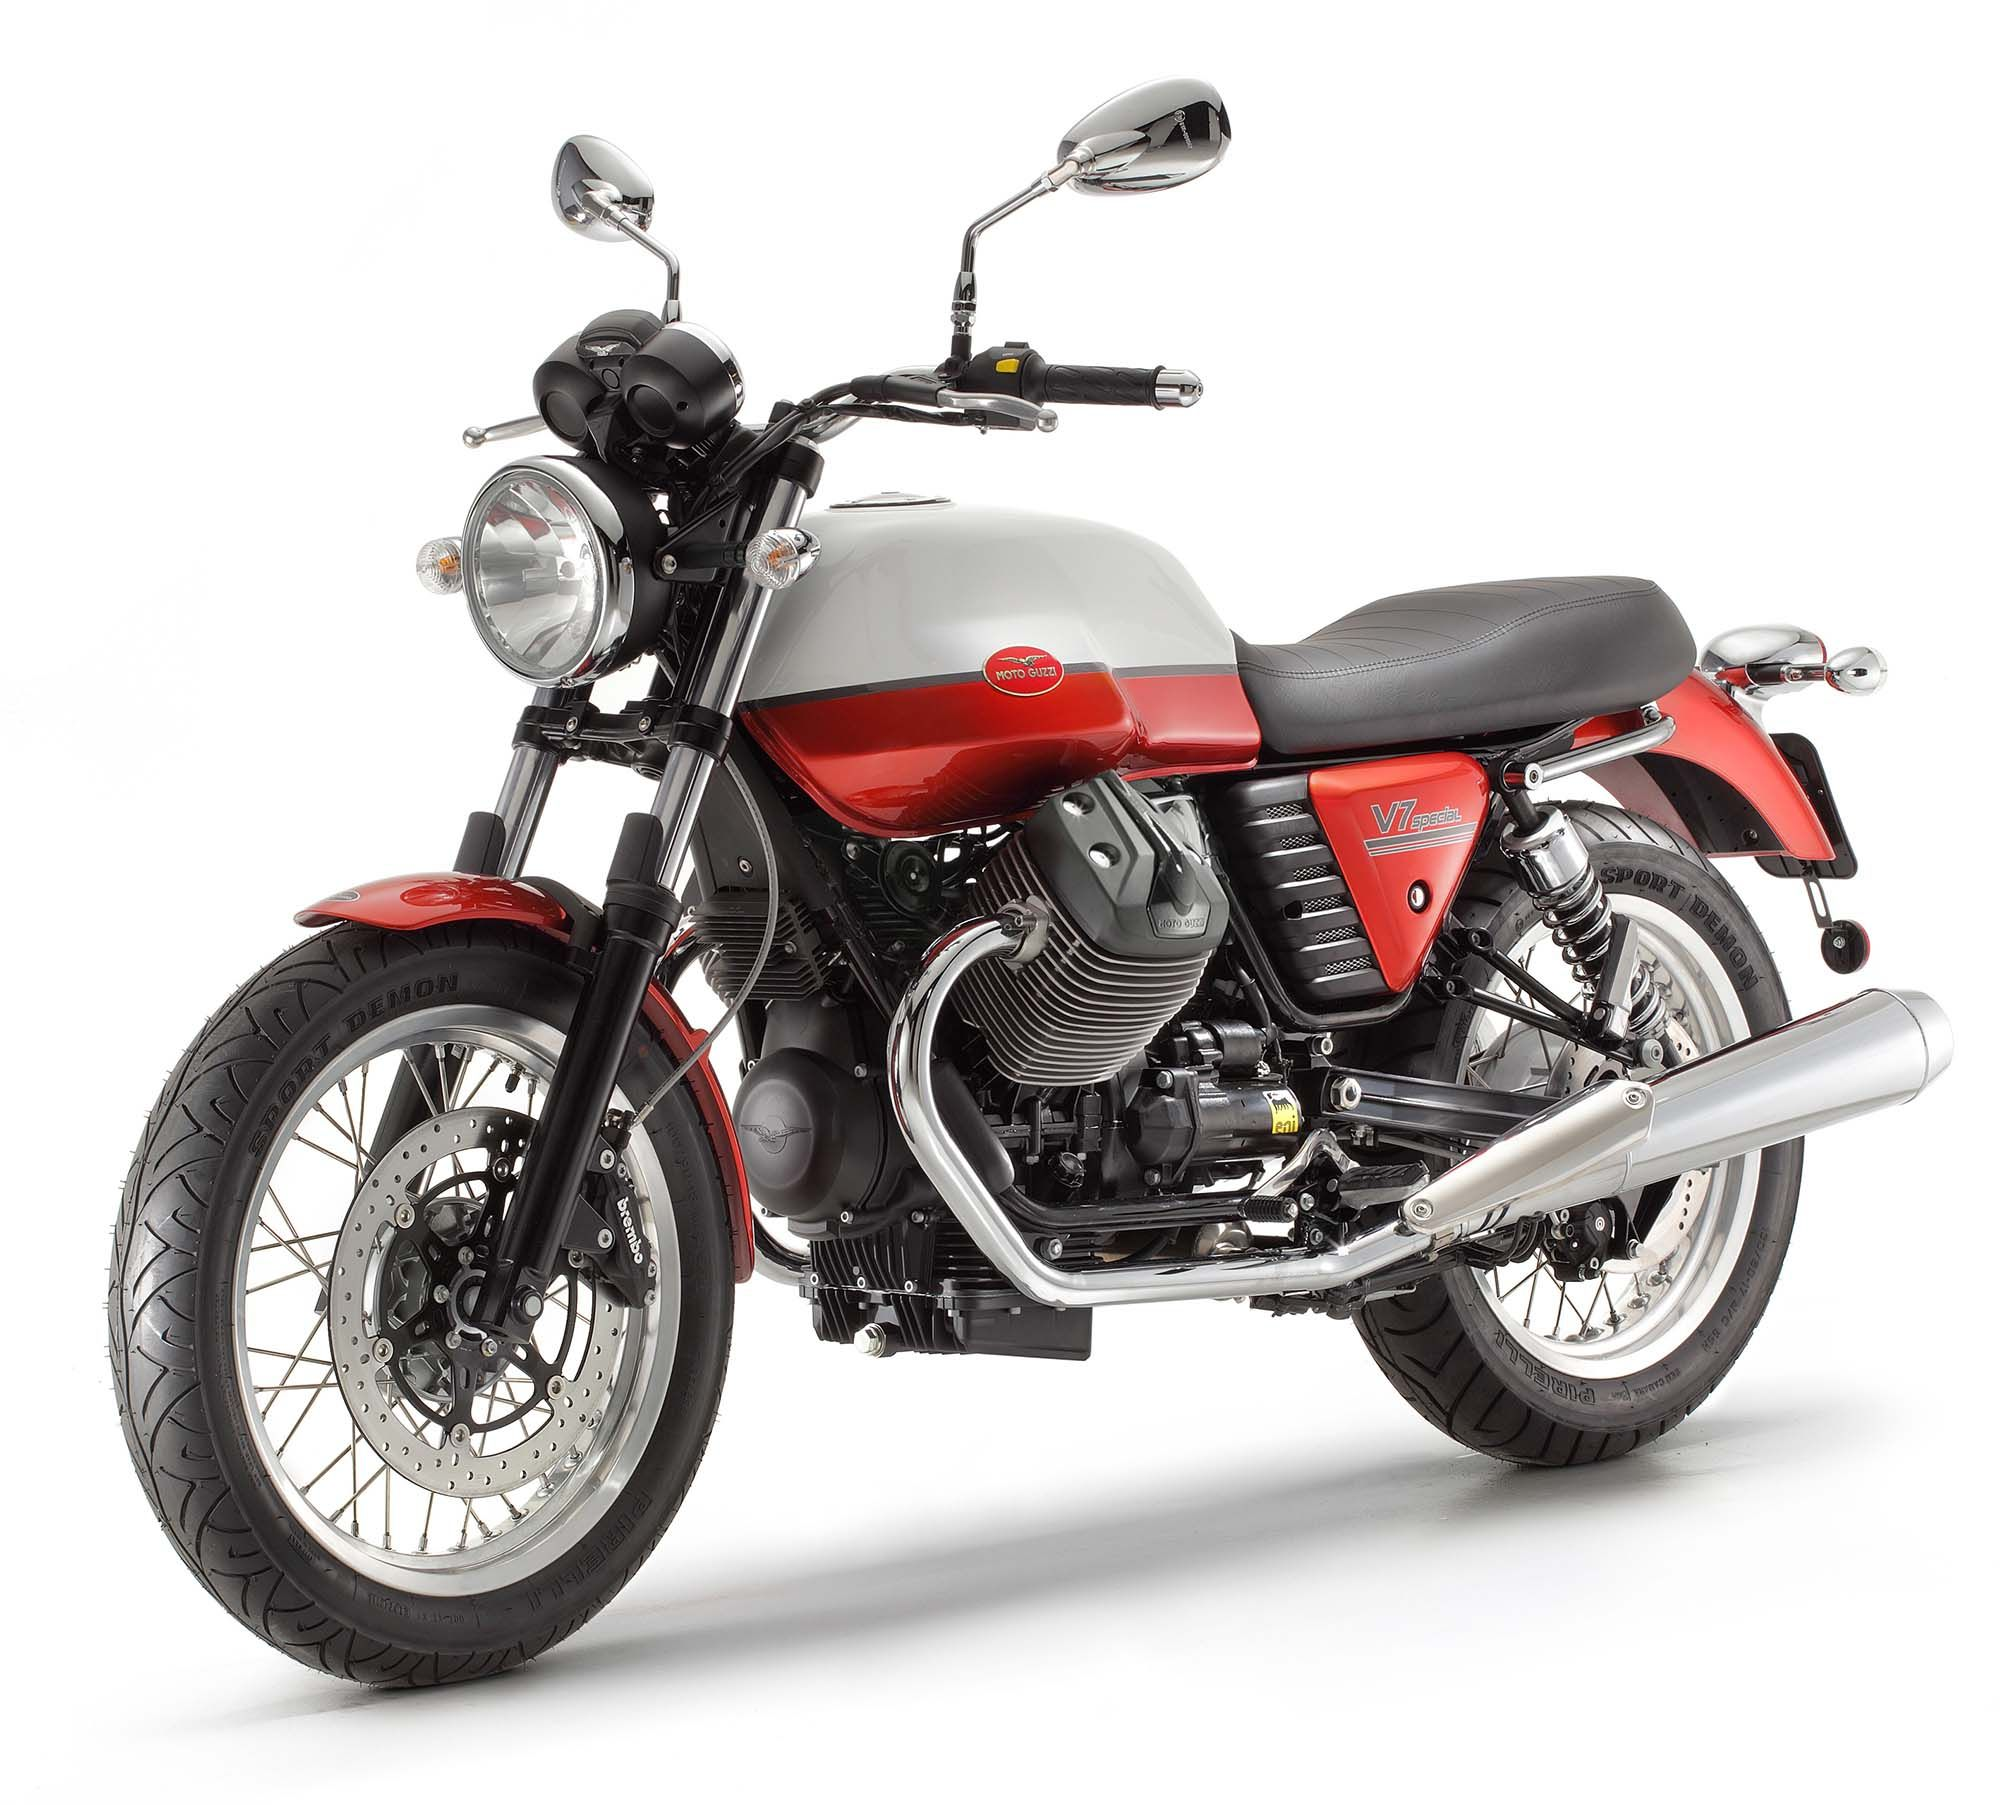 Three Moto Guzzi V7 Models Coming To America For 2013